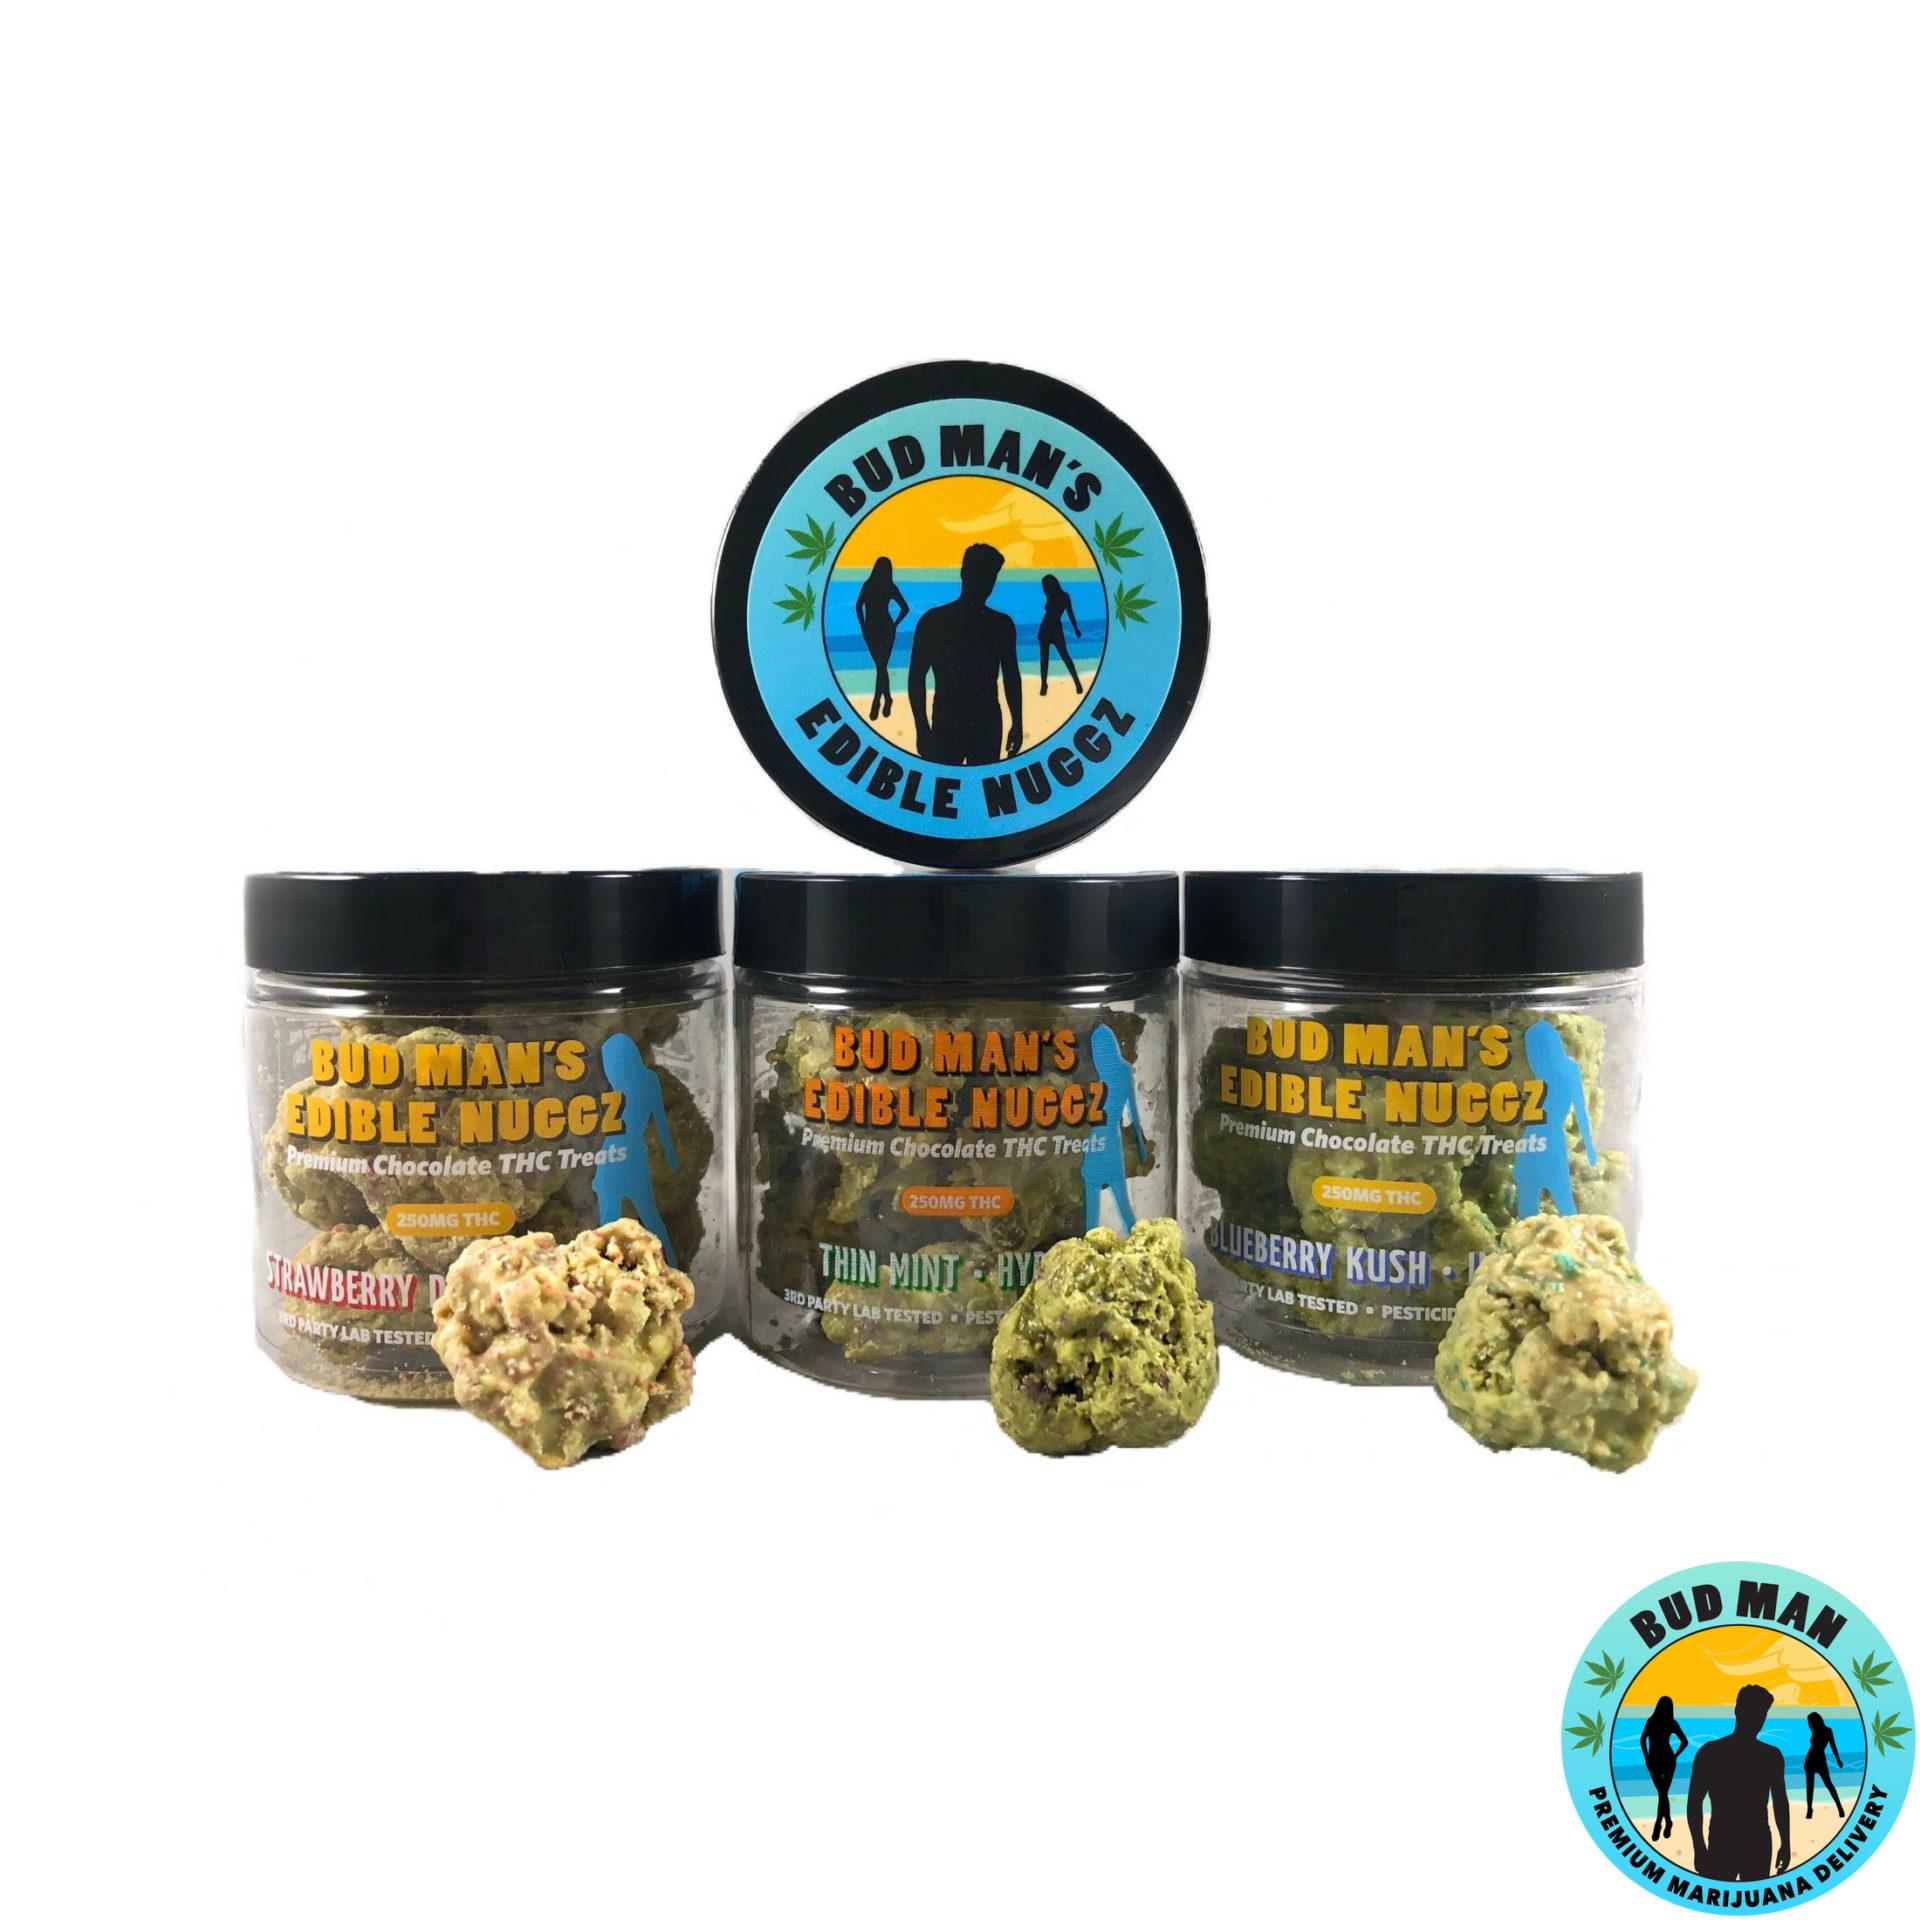 Bud Man OC Marijuana Delivery